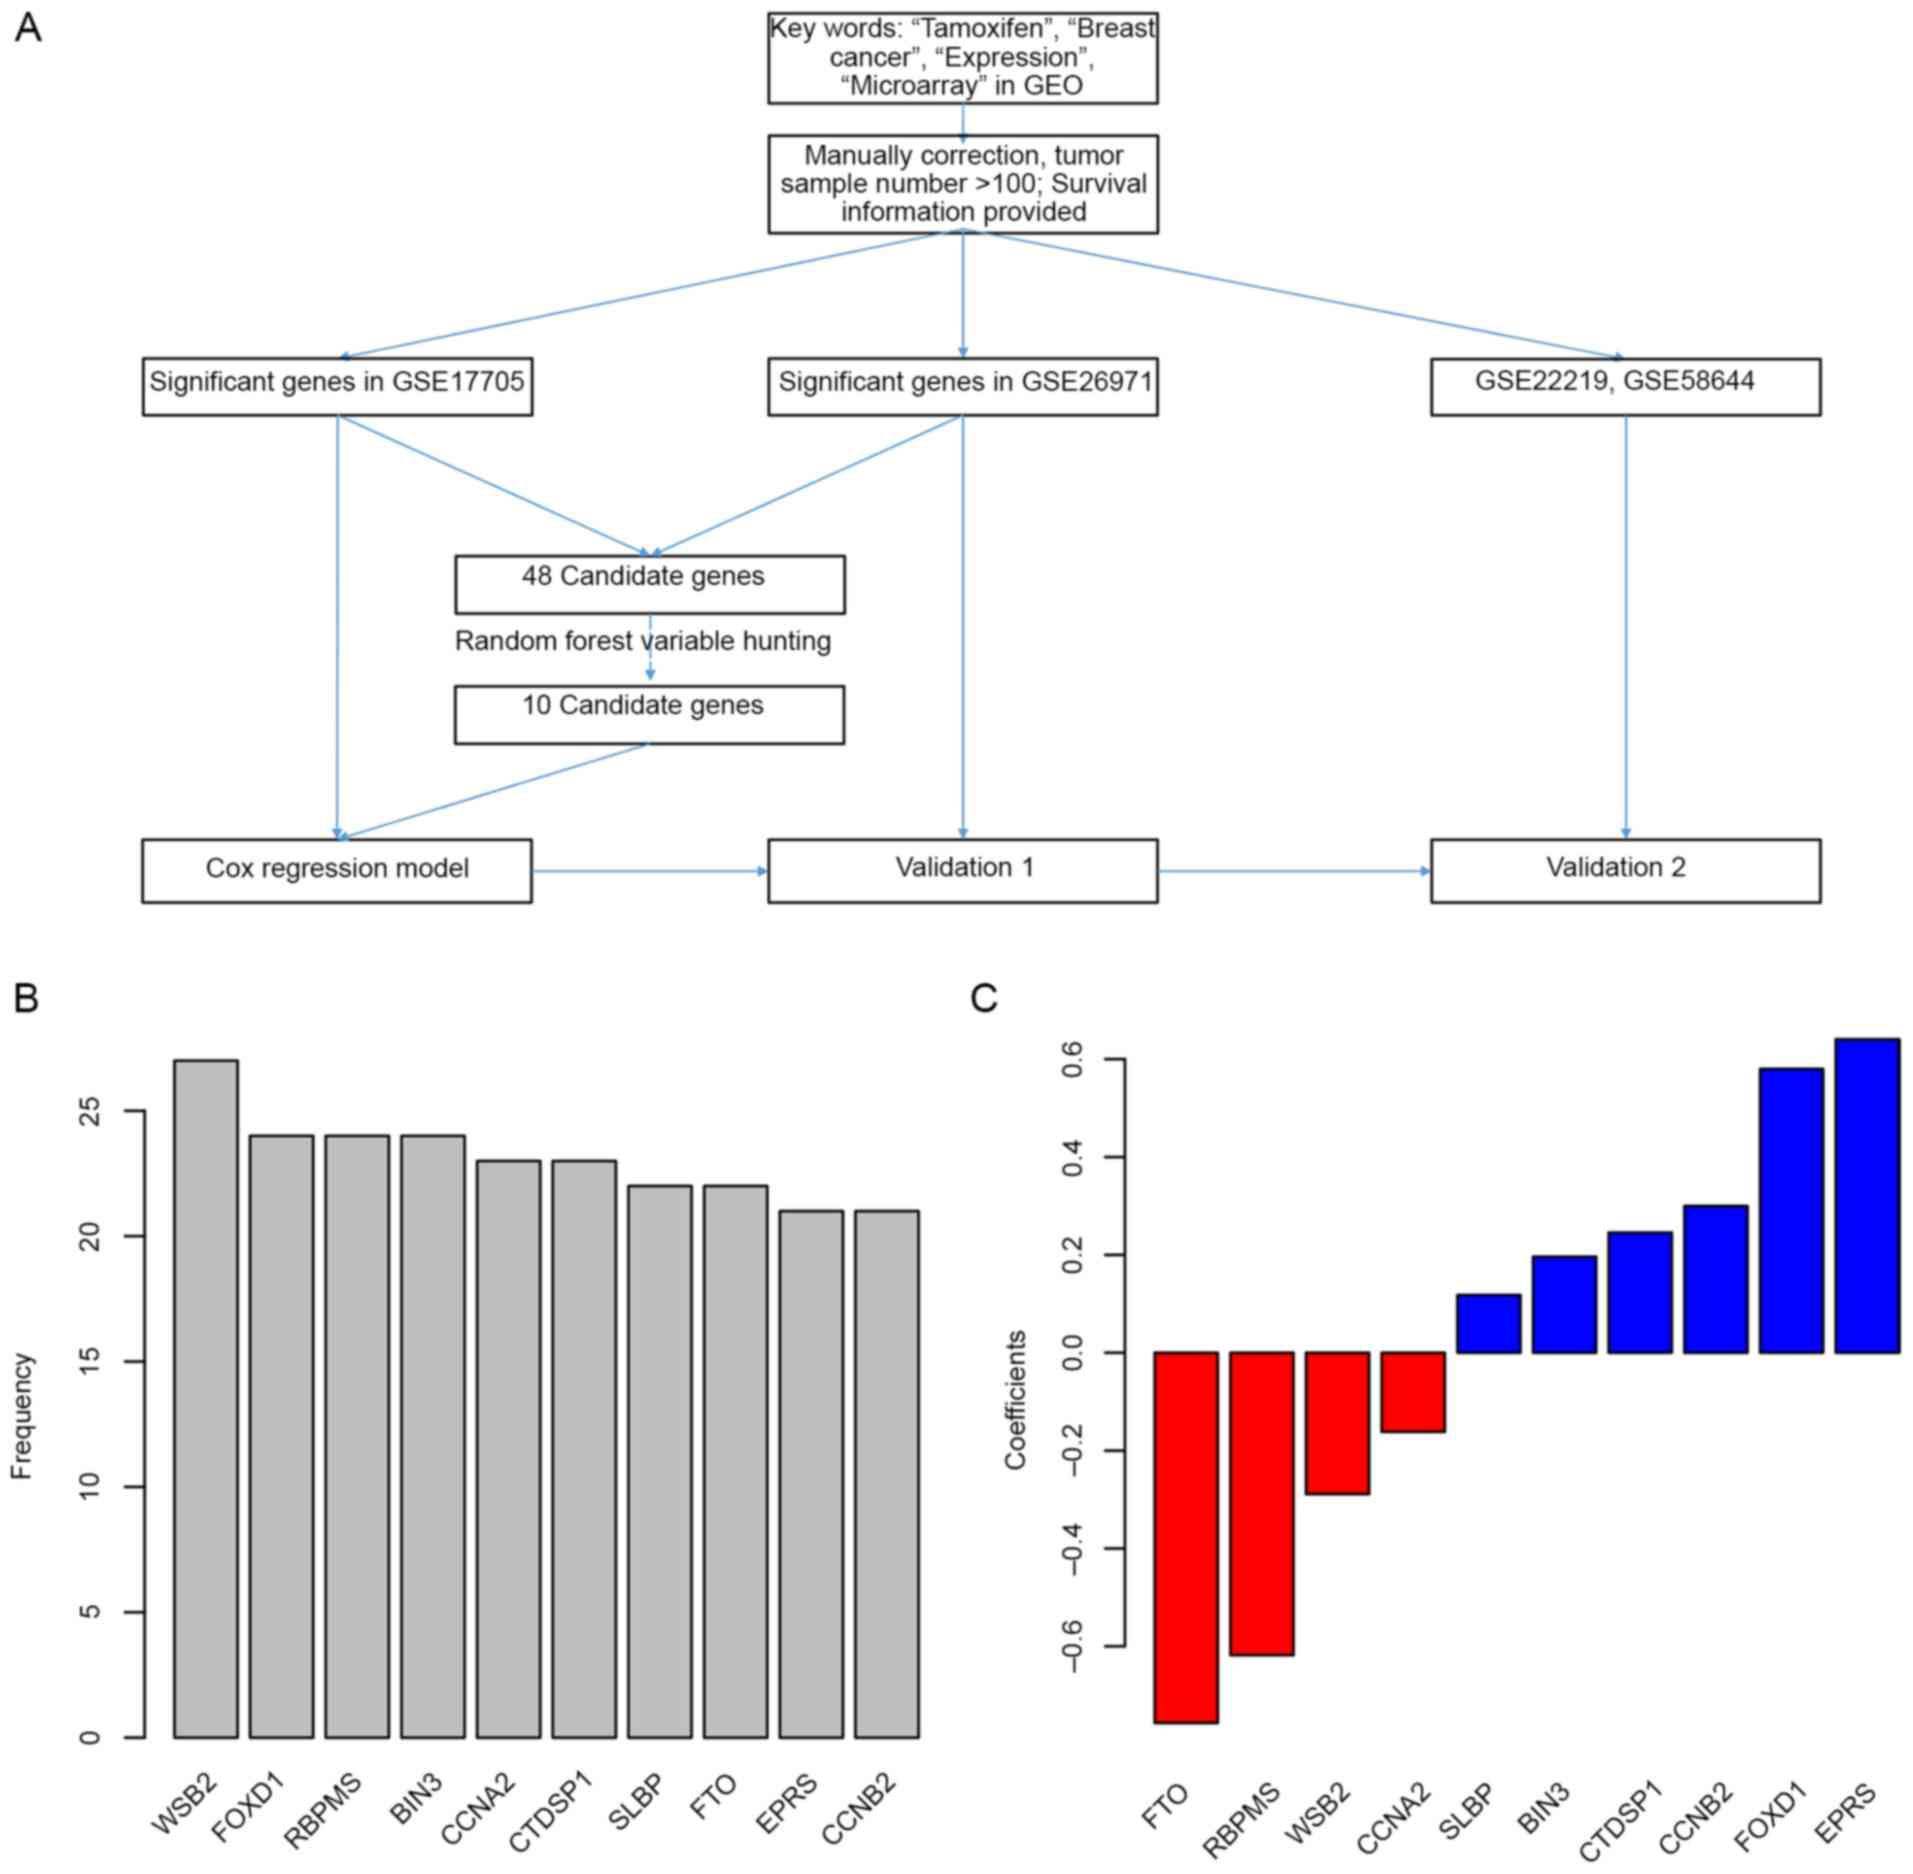 Transcriptomic Signature Predicts The Distant Relapse In